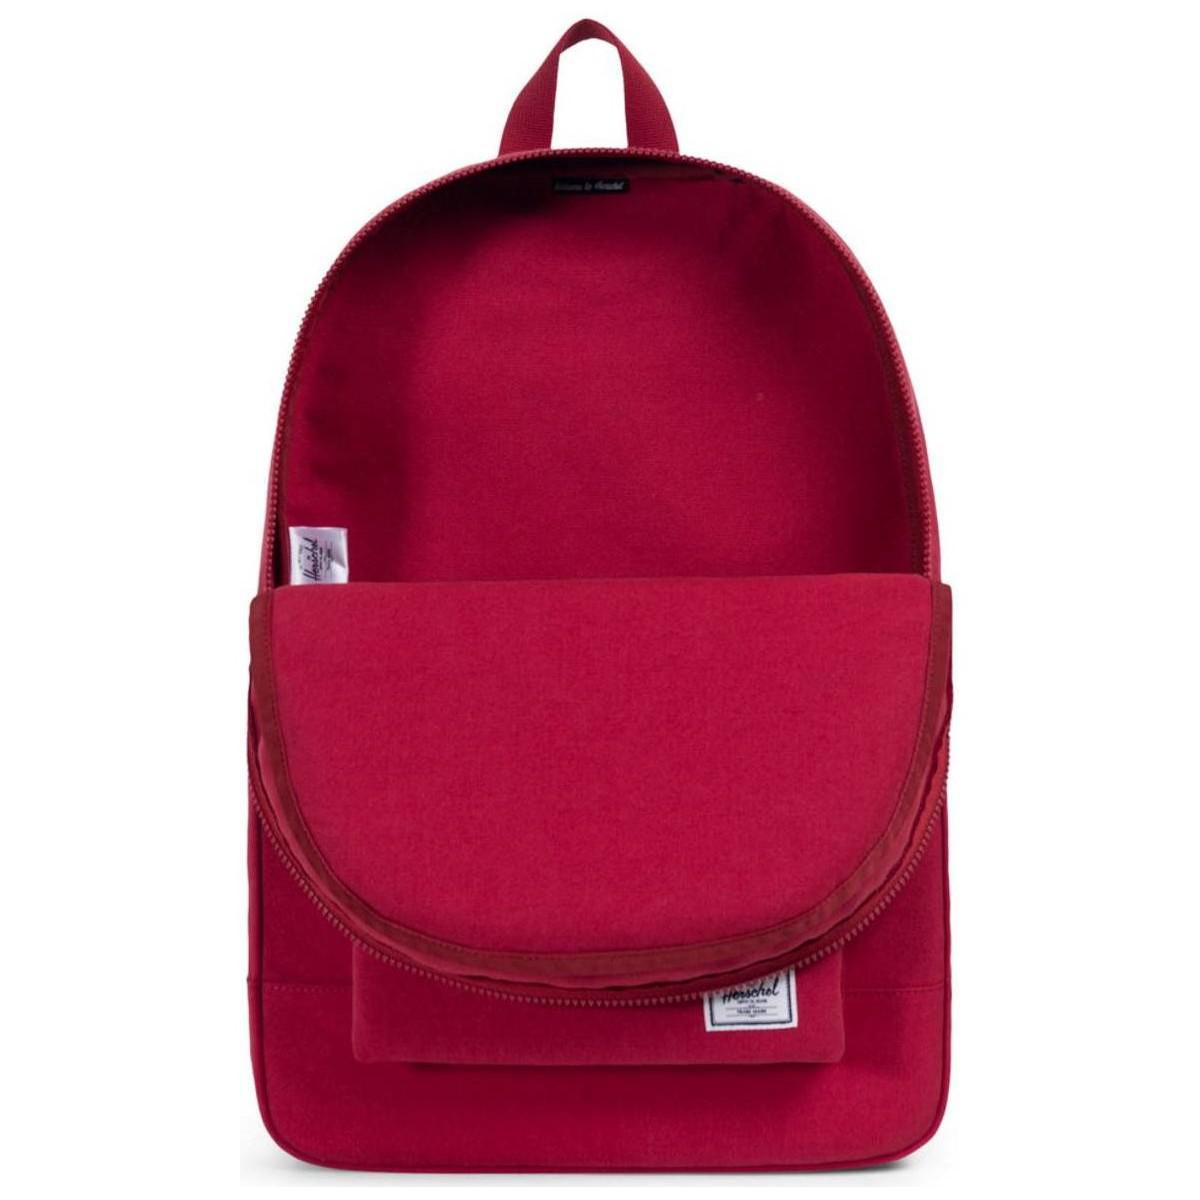 Herschel Supply Co. Packable Daypack Backpack - Brick Red Men s ... 5041afc74ed0f